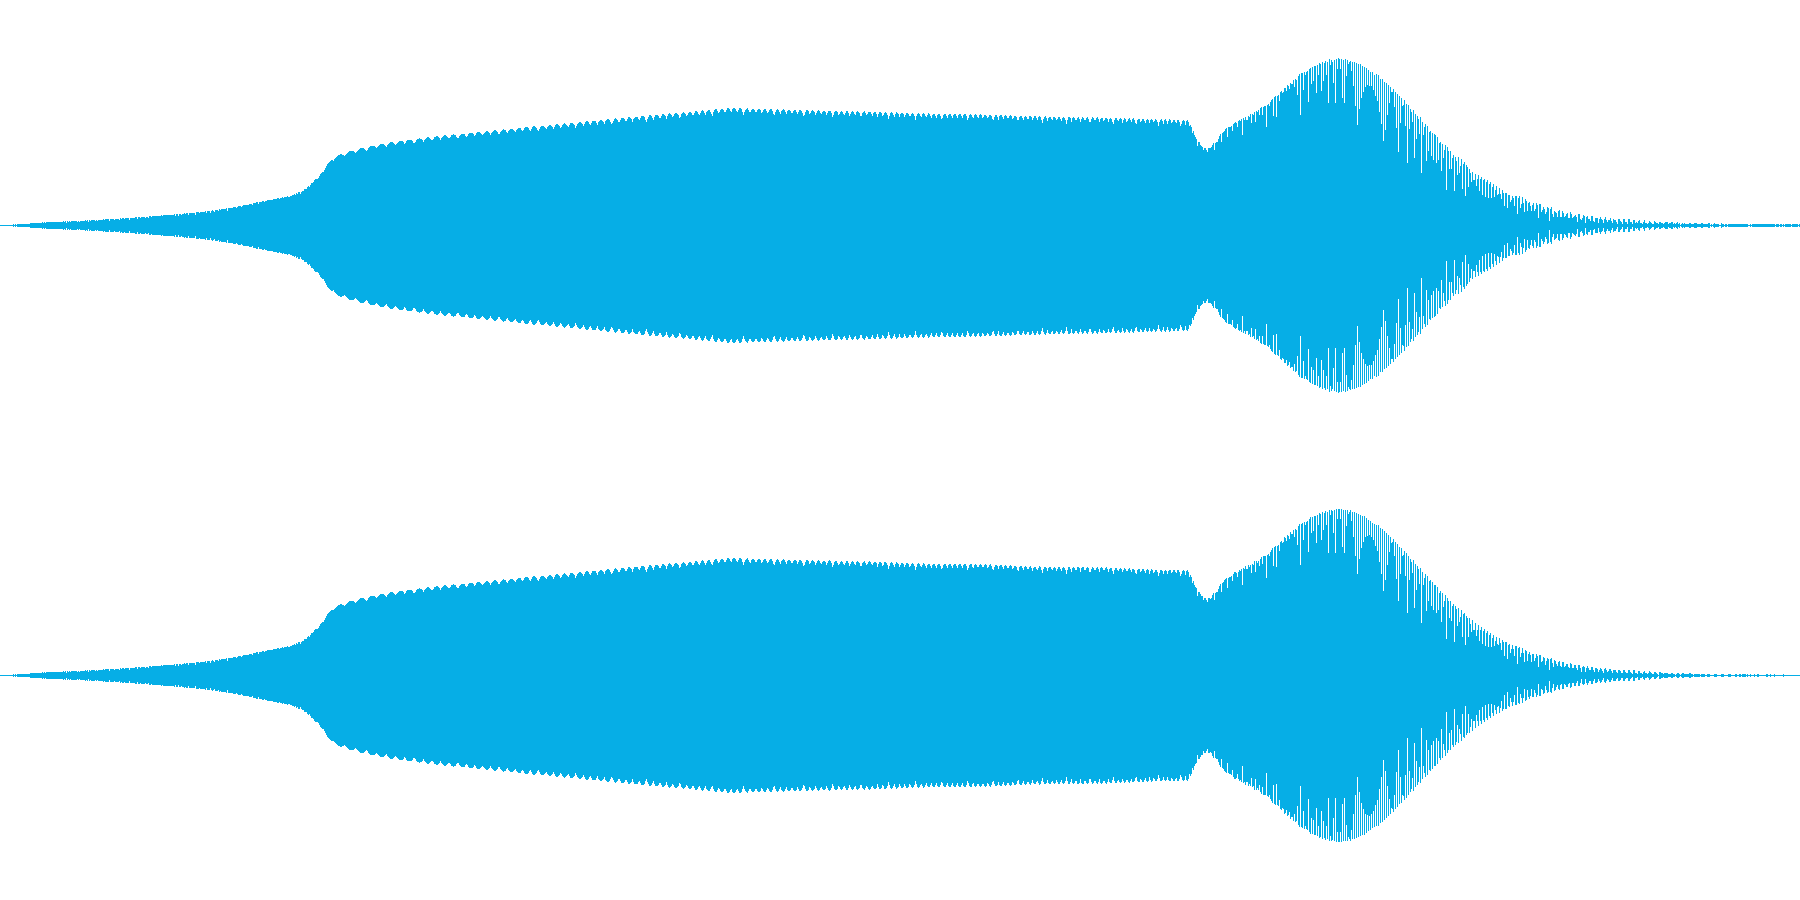 Robo ロボットが発する動作音1の再生済みの波形